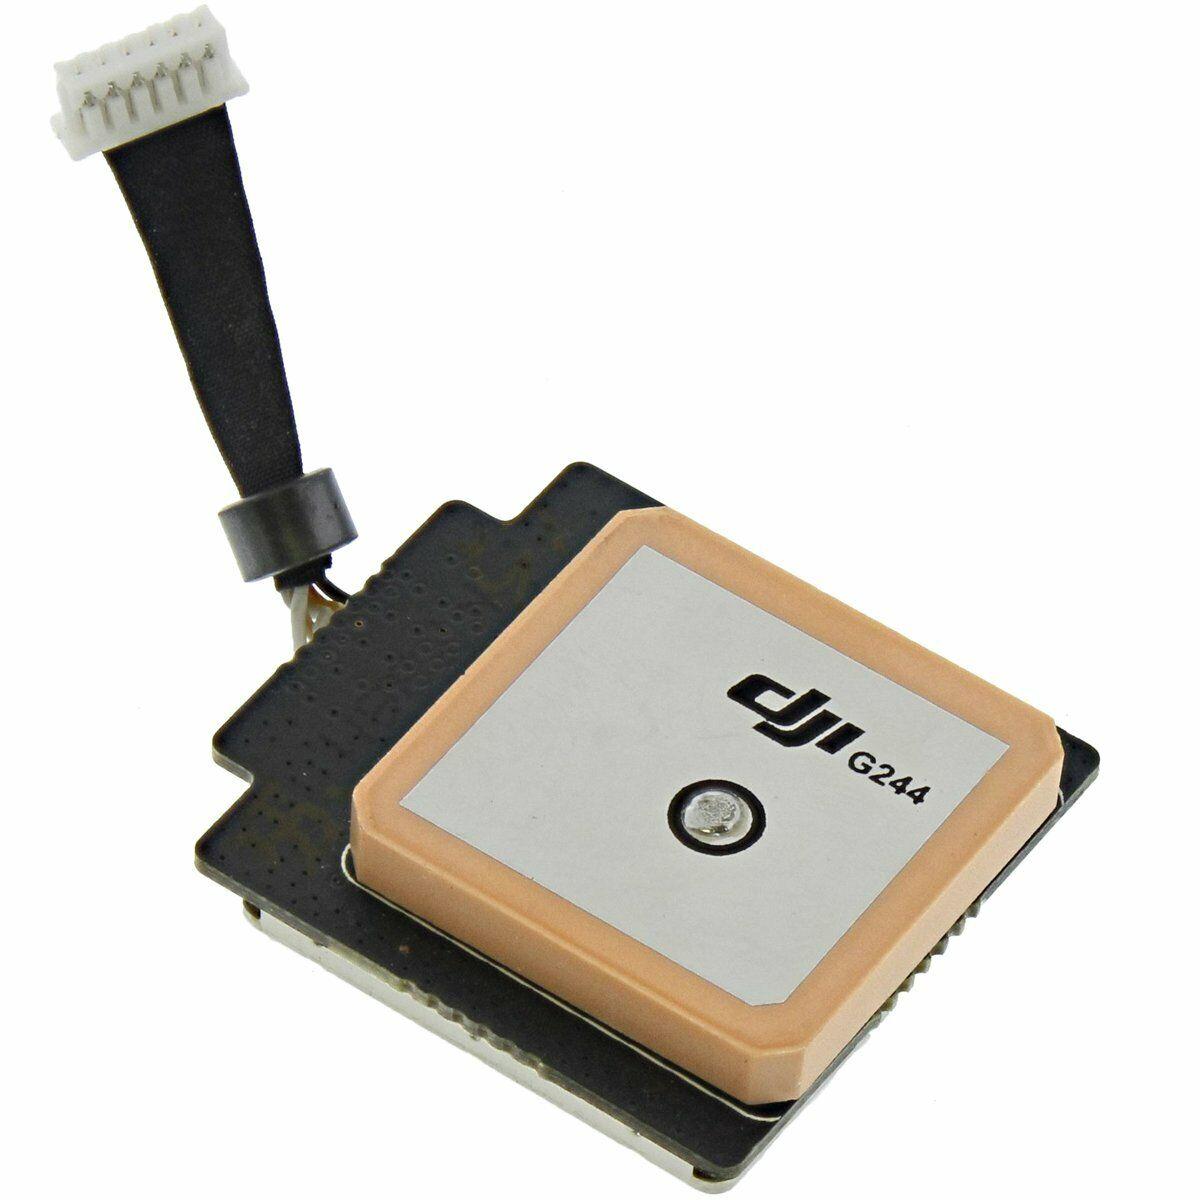 DJI  Mavic Pro Service Part - GPS Module - Original OEM - US Dealer  ordina ora con grande sconto e consegna gratuita